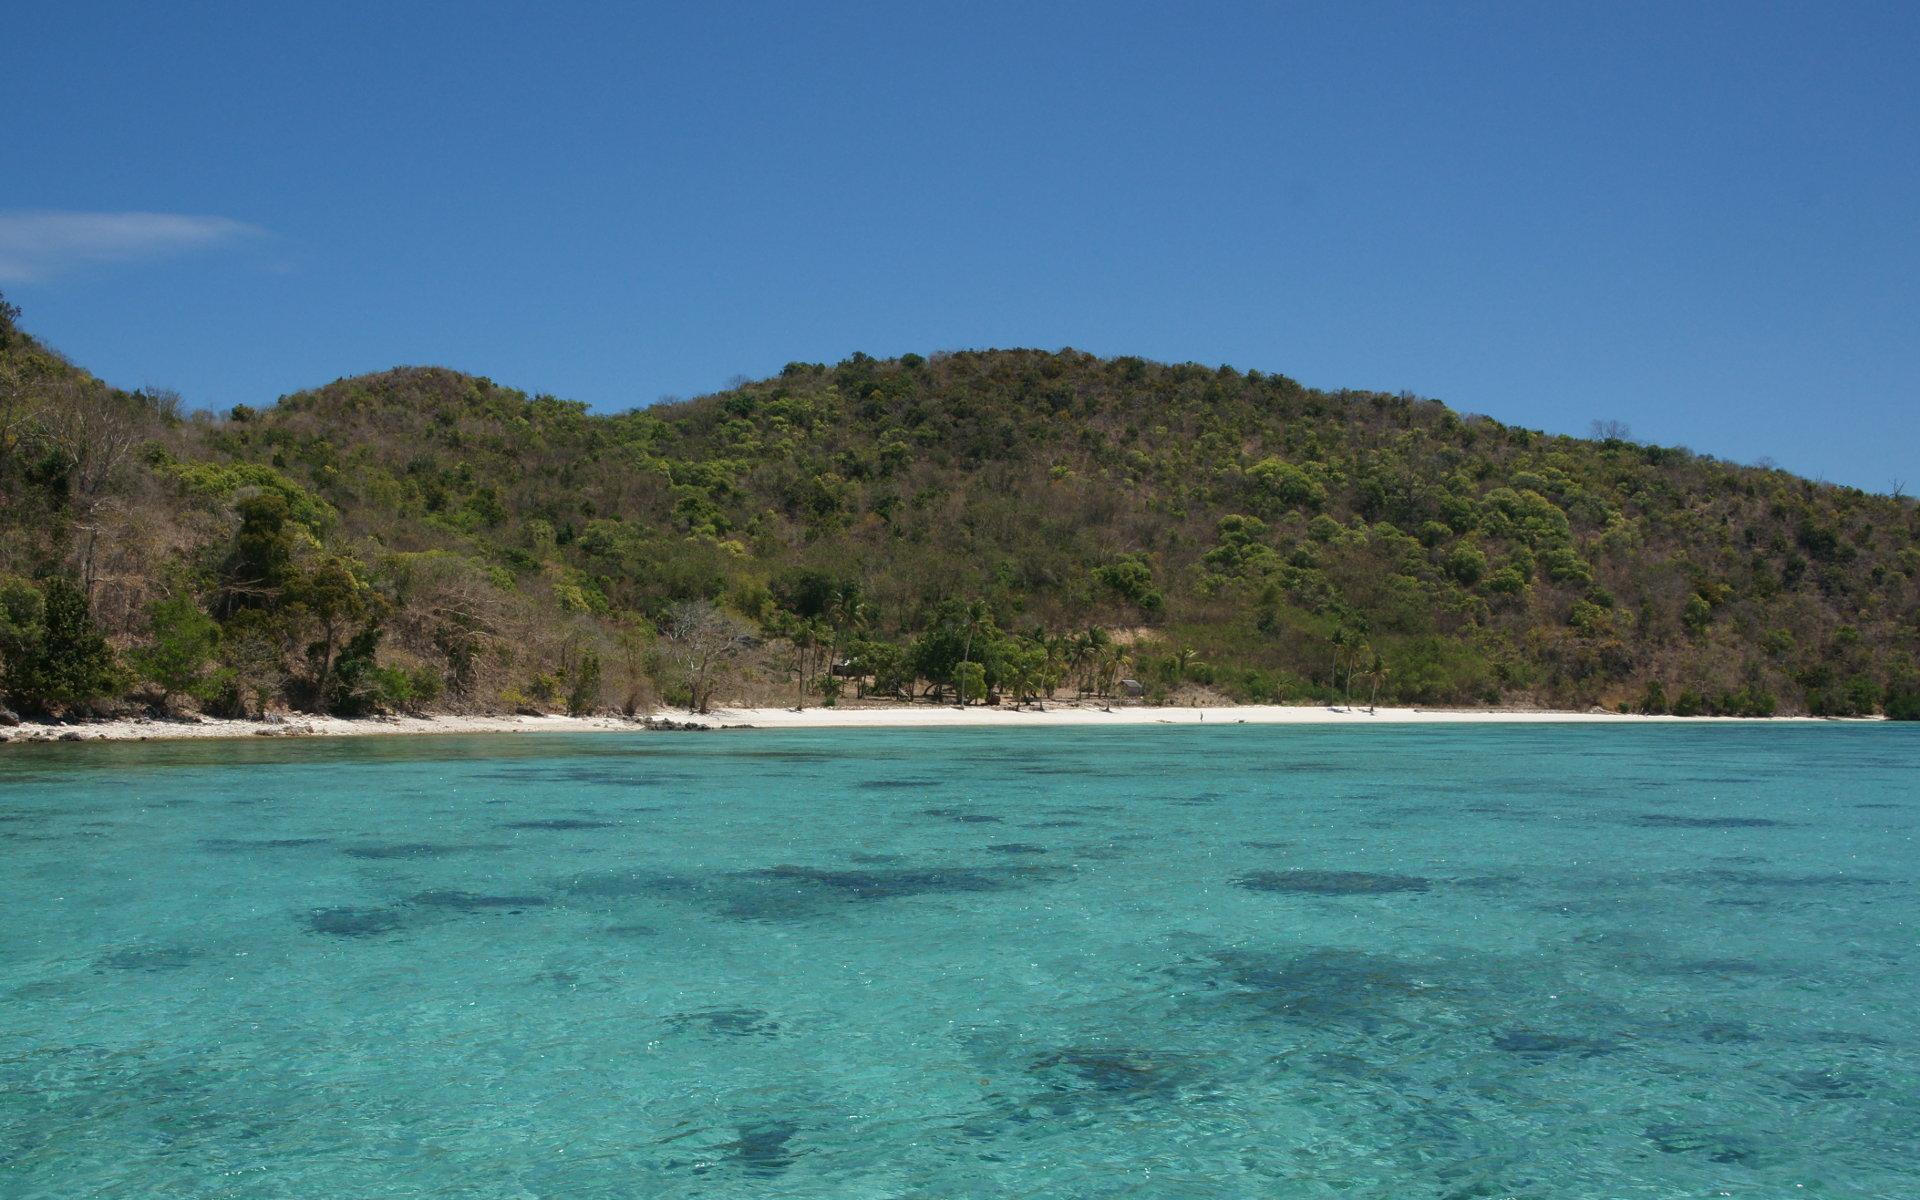 Beautiful Island Pictures For Wallpaper: Beautiful Tropical Islands Desktop Wallpaper